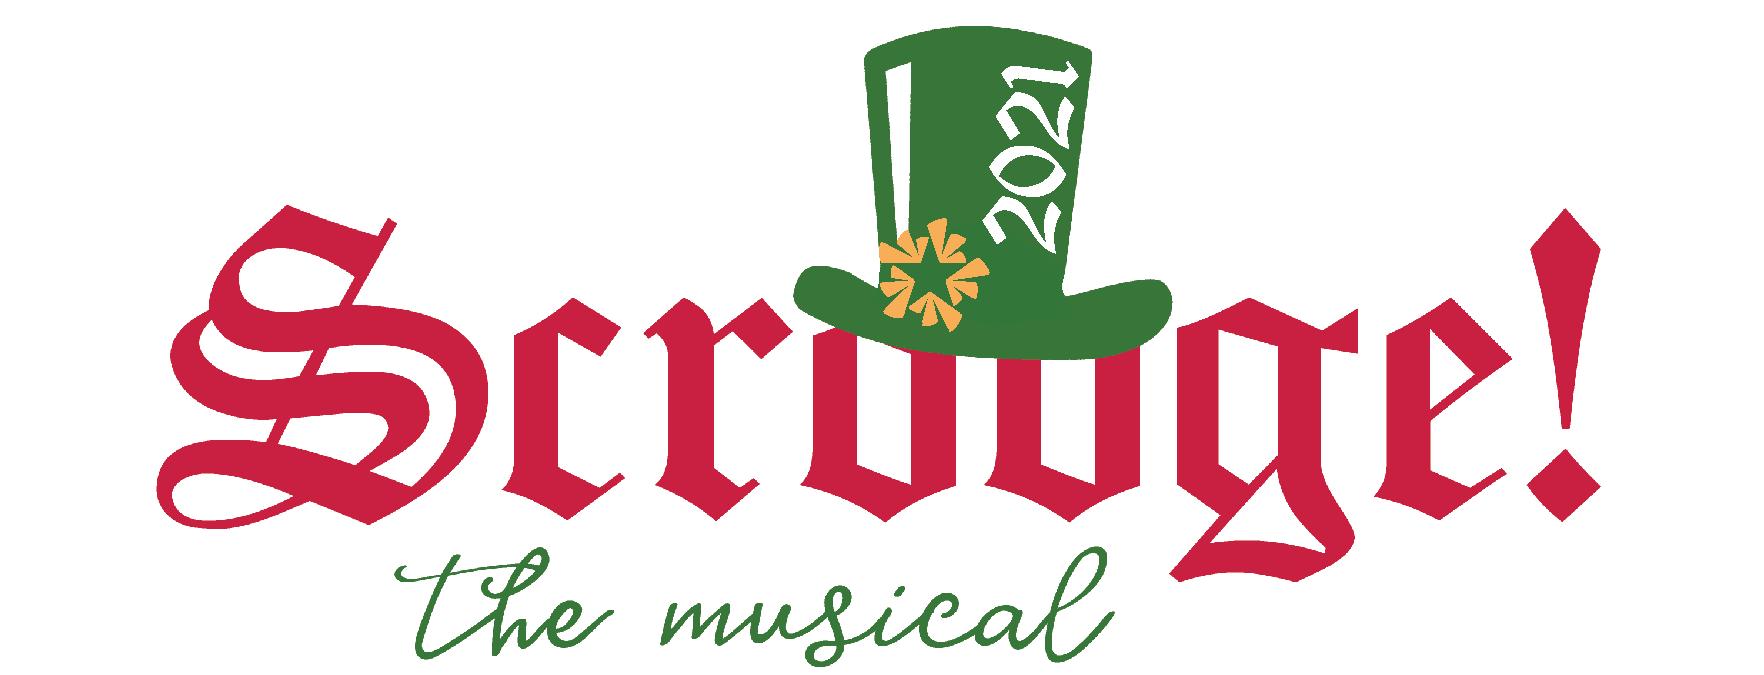 2021 NTPA Scrooge the Musical logo